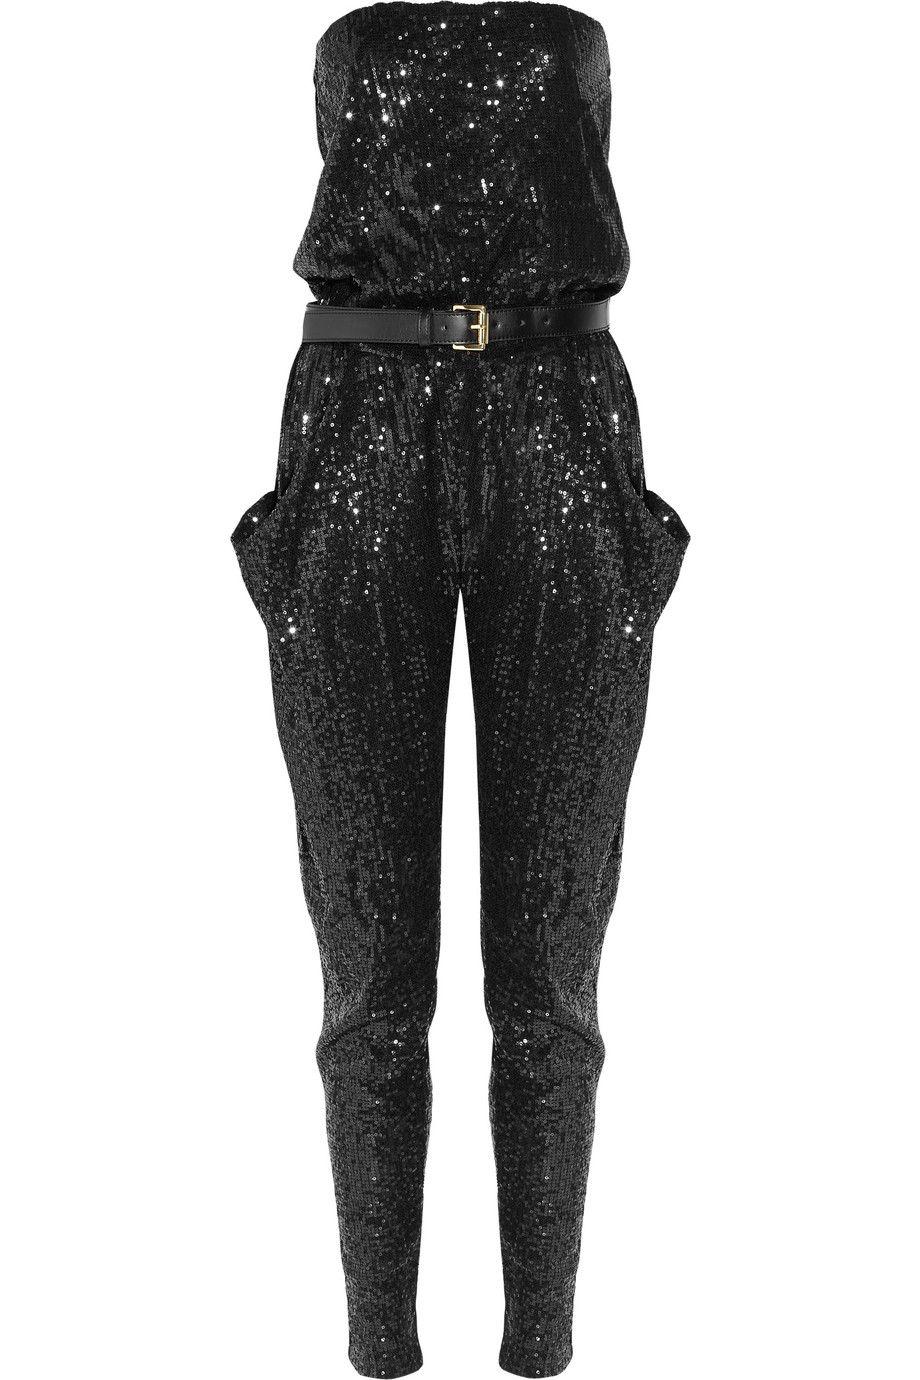 0bdc5b5a86a MICHAEL Michael Kors Strapless sequined jumpsuit 1